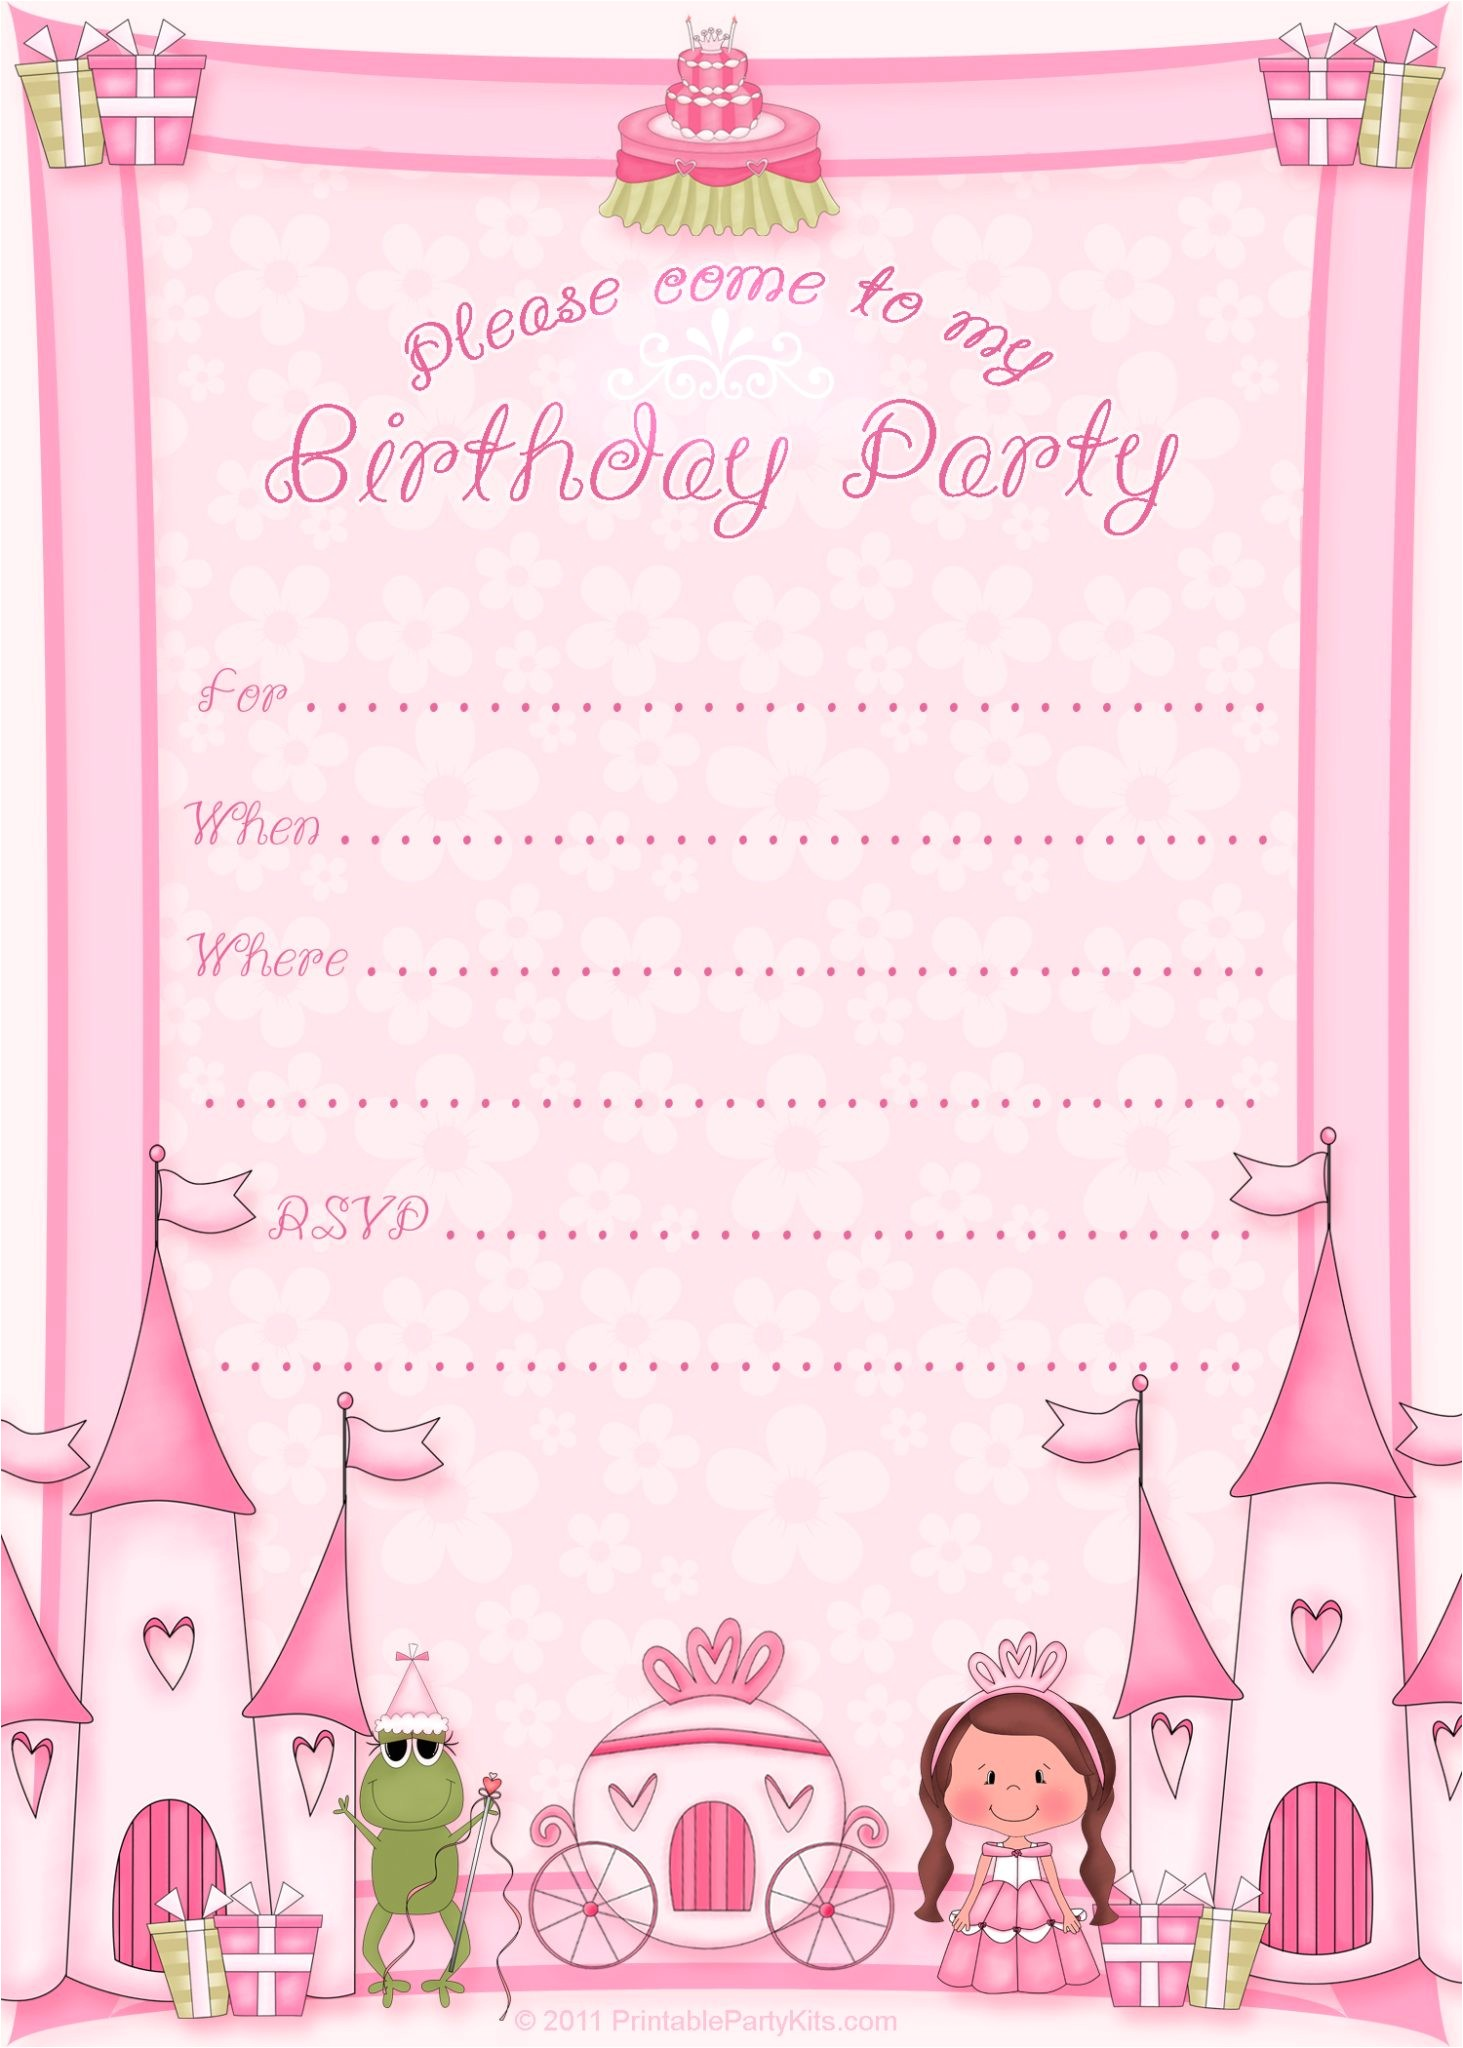 Princess Party Invitations Free Printable Girls Printable Party Kits